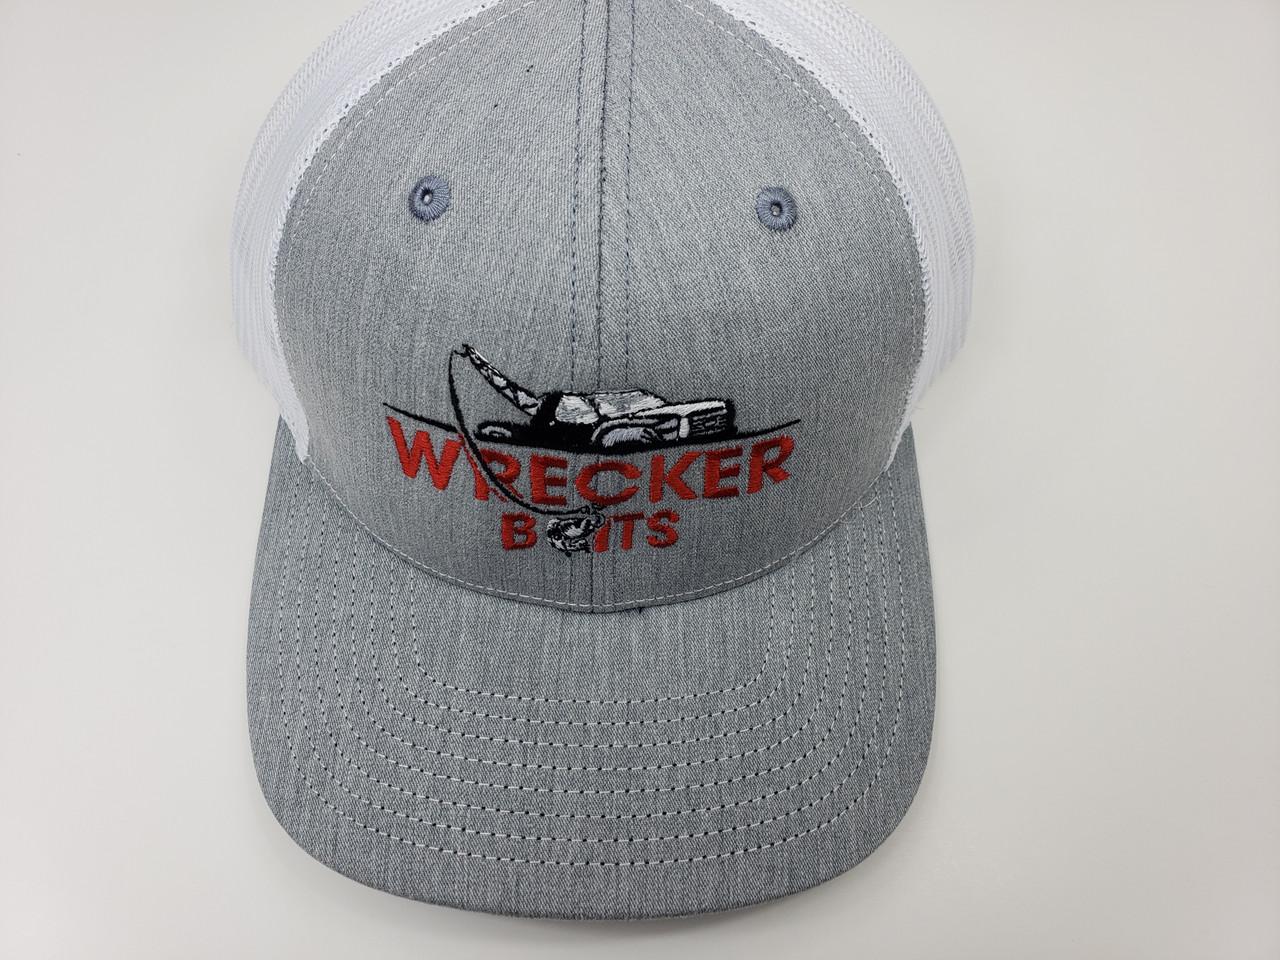 Wrecker Baits Fishing Hat